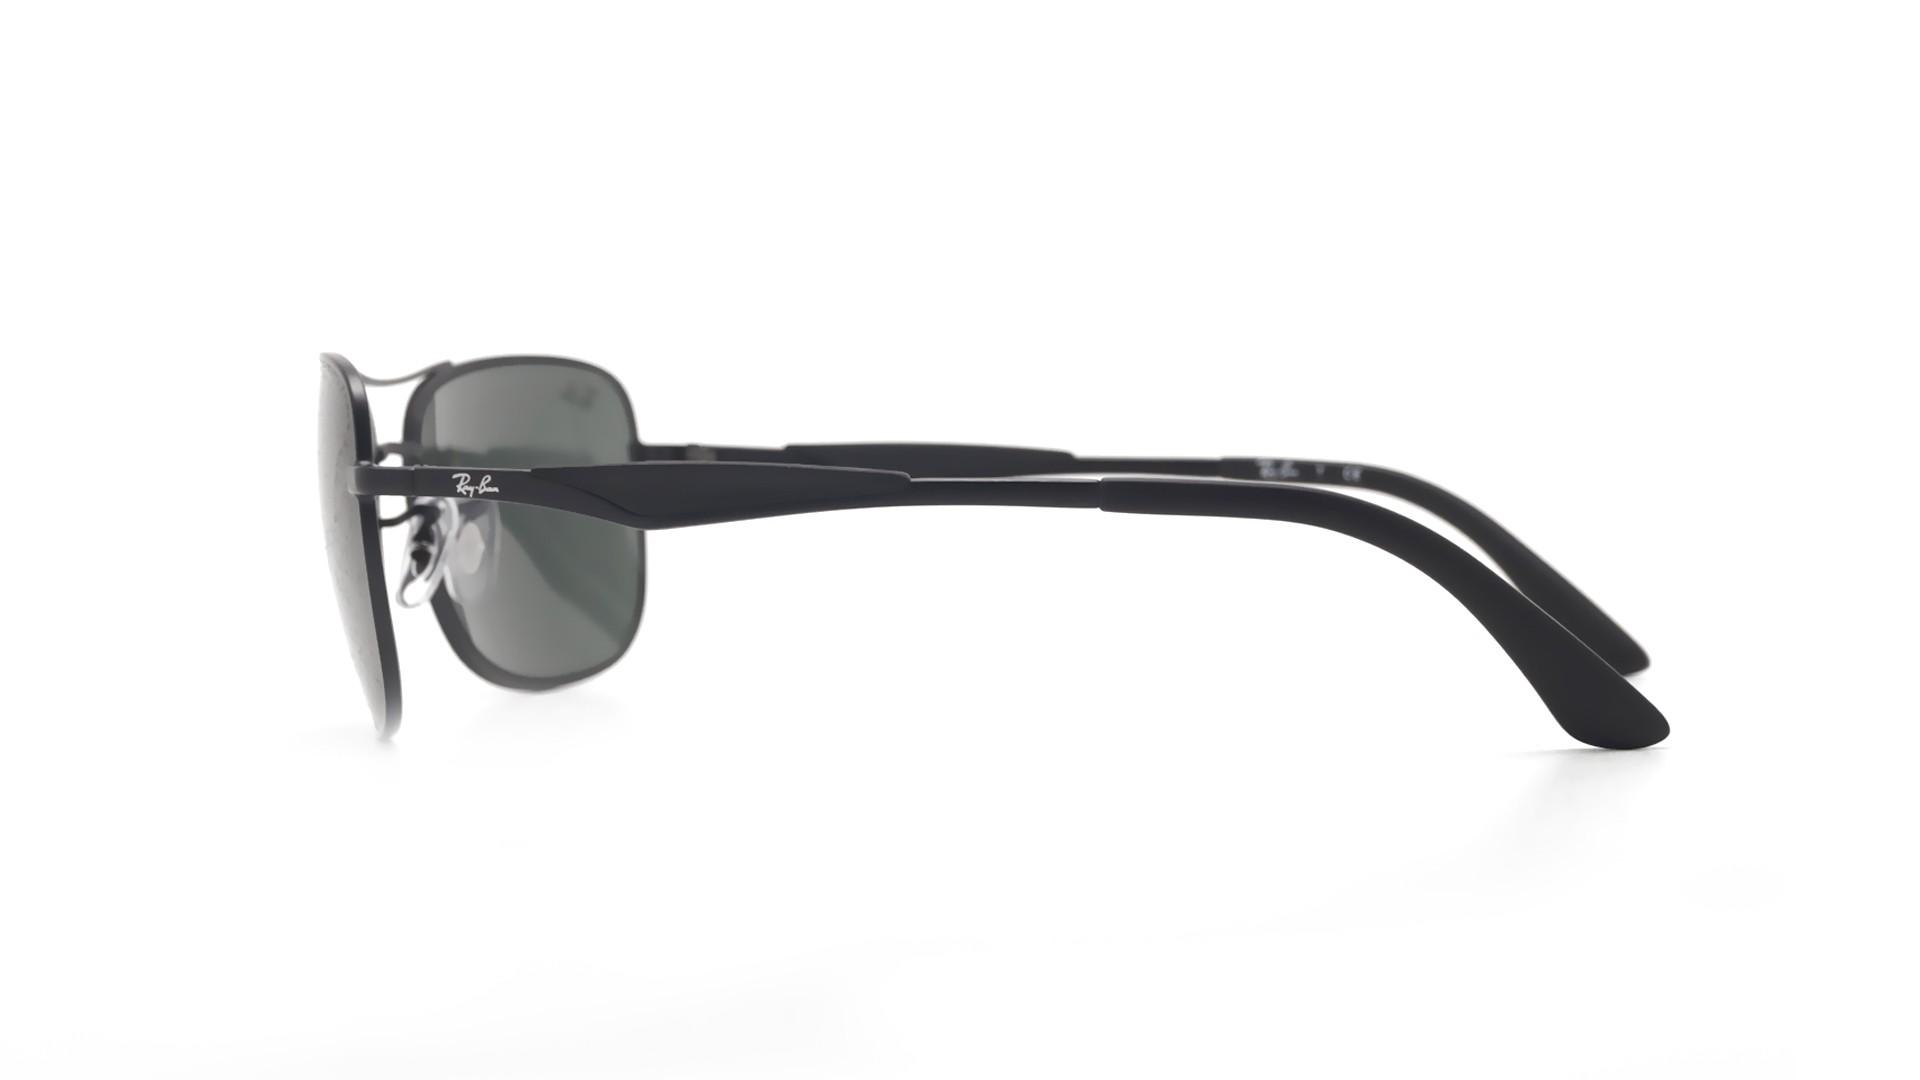 0b4343bc4c Sunglasses Ray-Ban RB3515 006 71 61-17 Black Matte Large